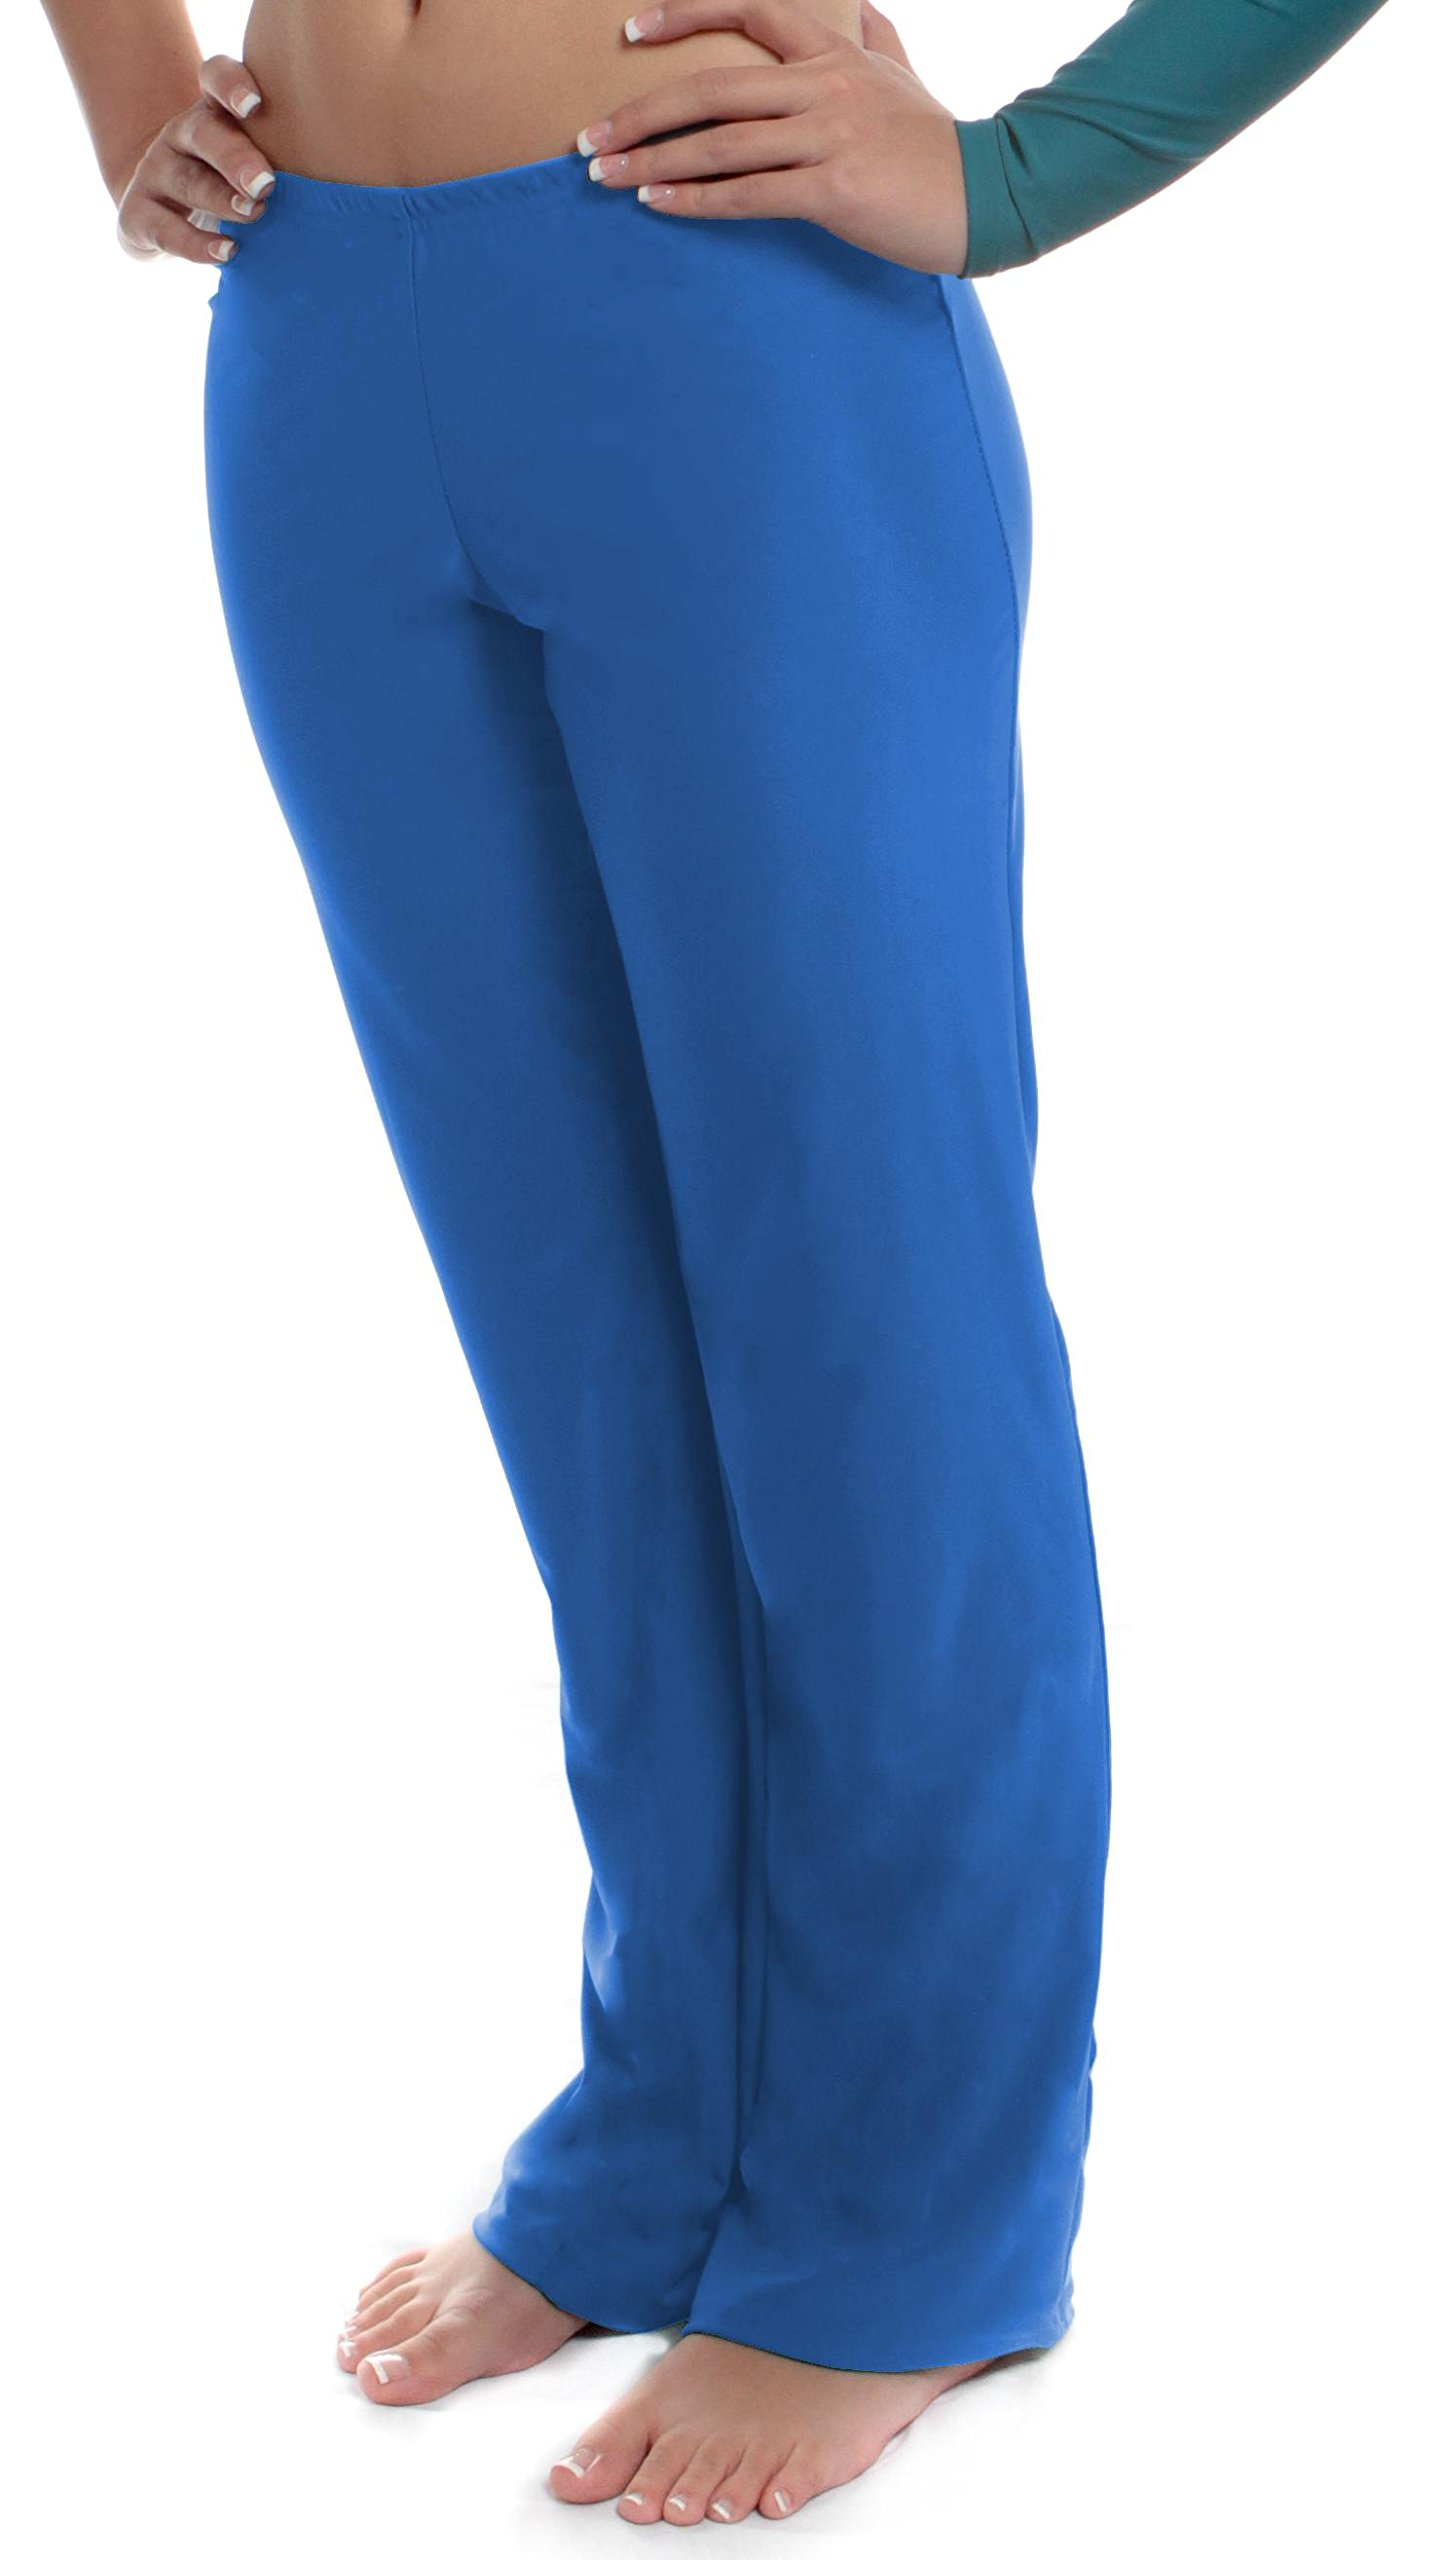 B Dancewear Girls Jazz Pants X-Large Blue Child and Kid Sizes by B Dancewear